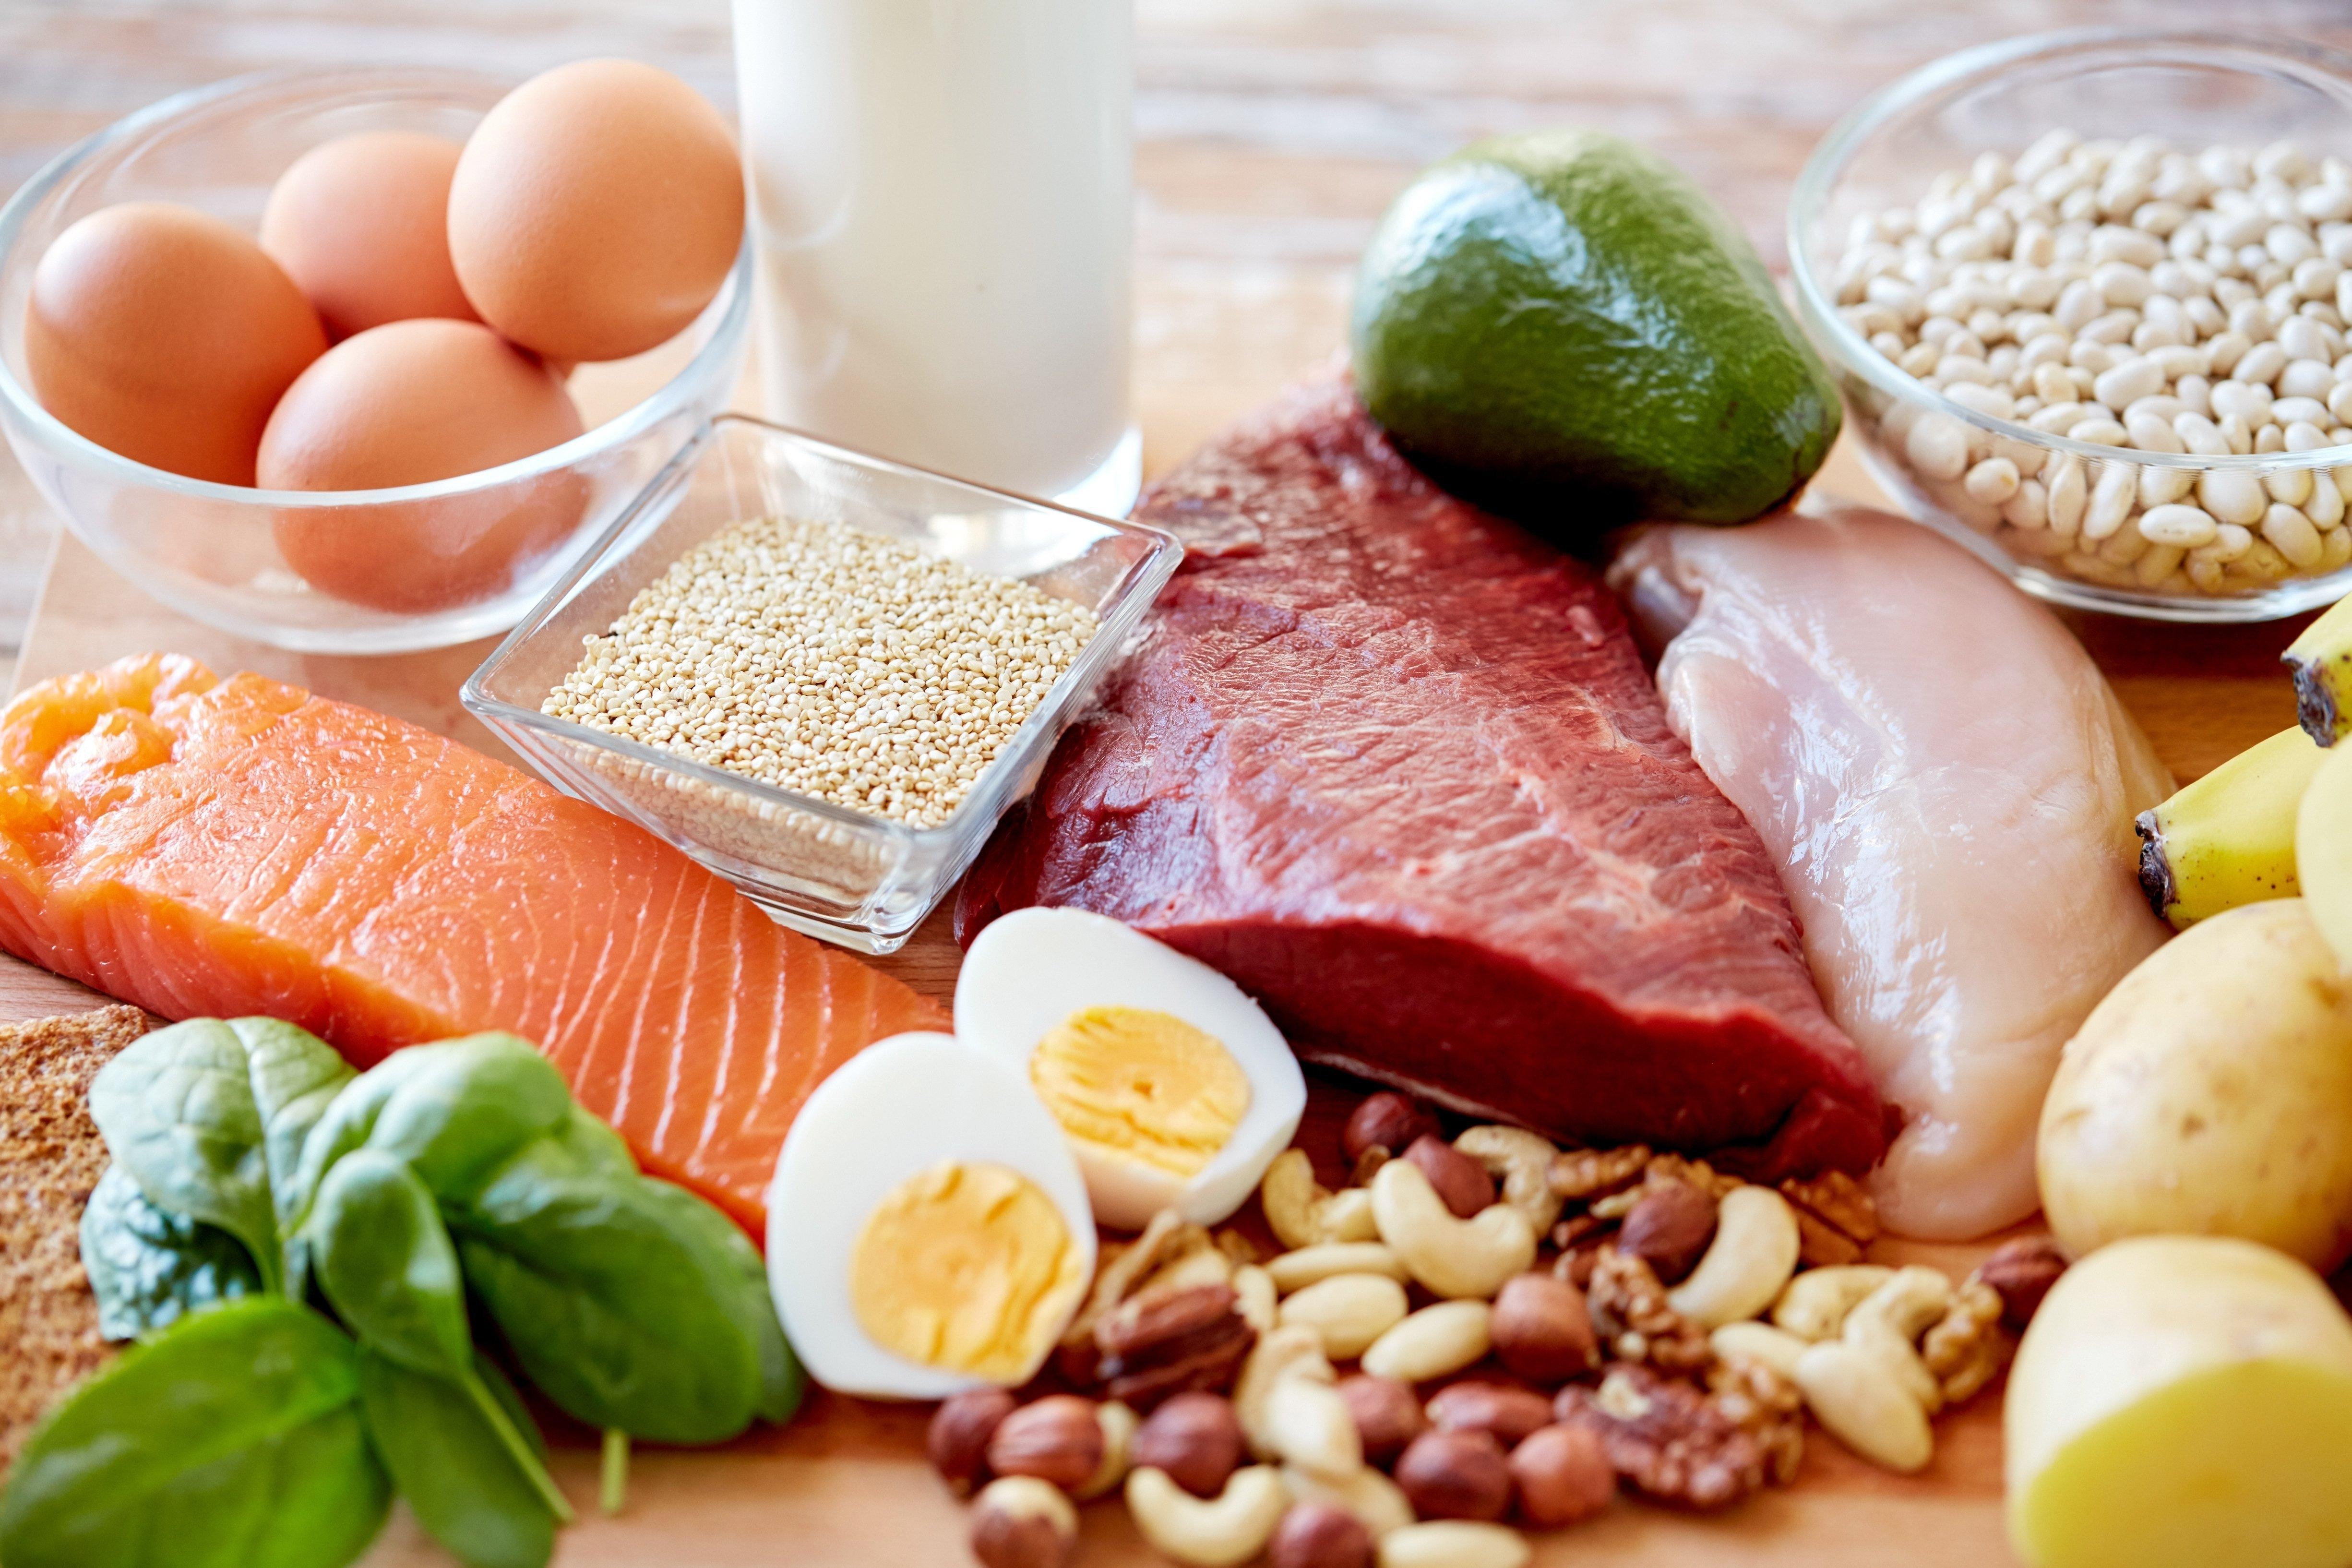 Balanced diet. | Source: Shutterstock